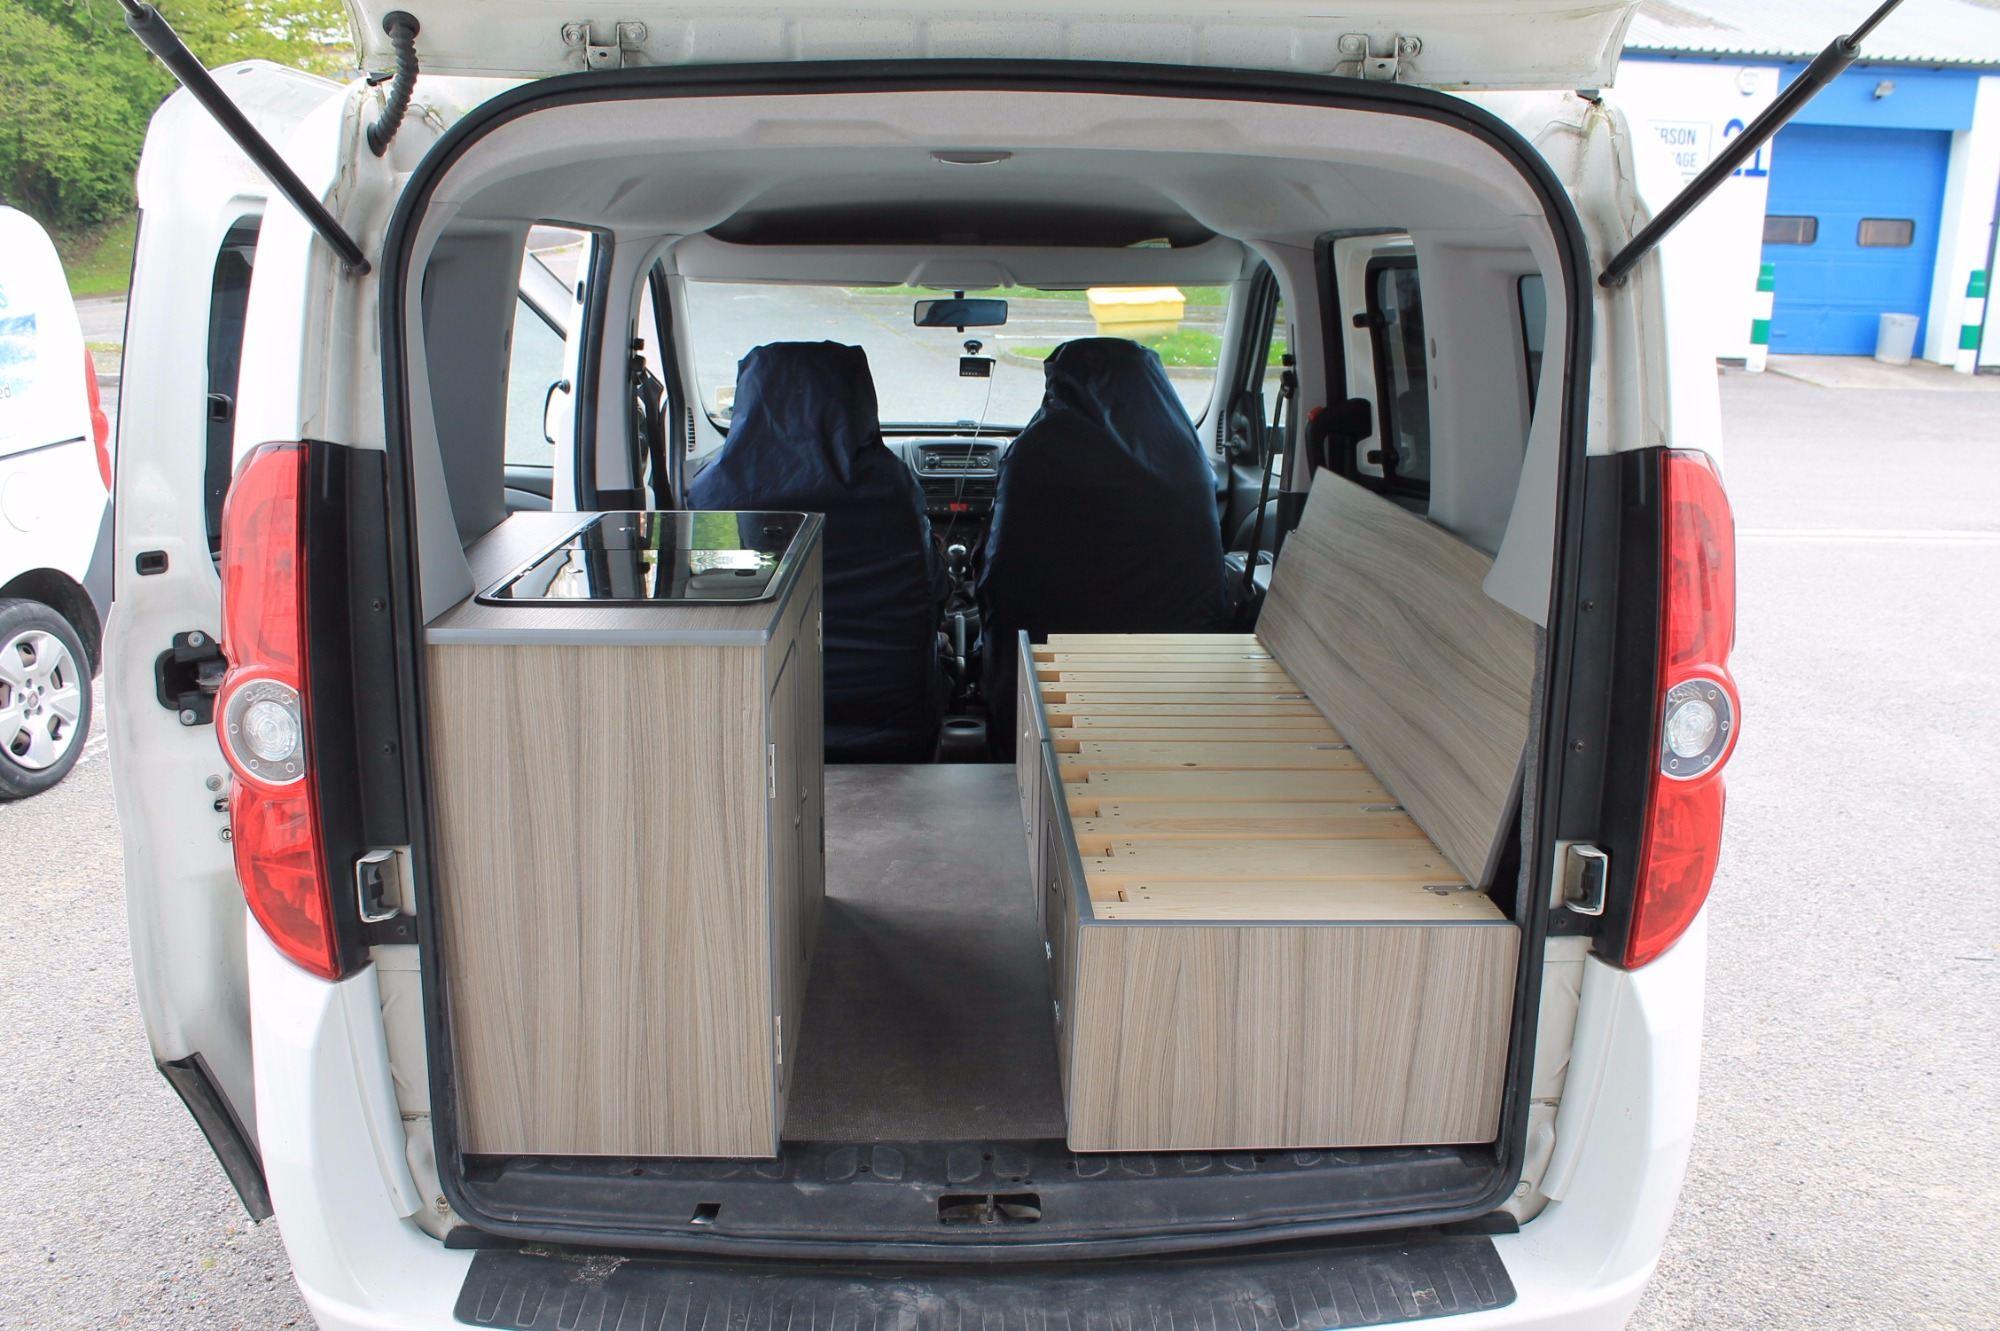 Fiat Doblo 2 Seater Micro Campervan